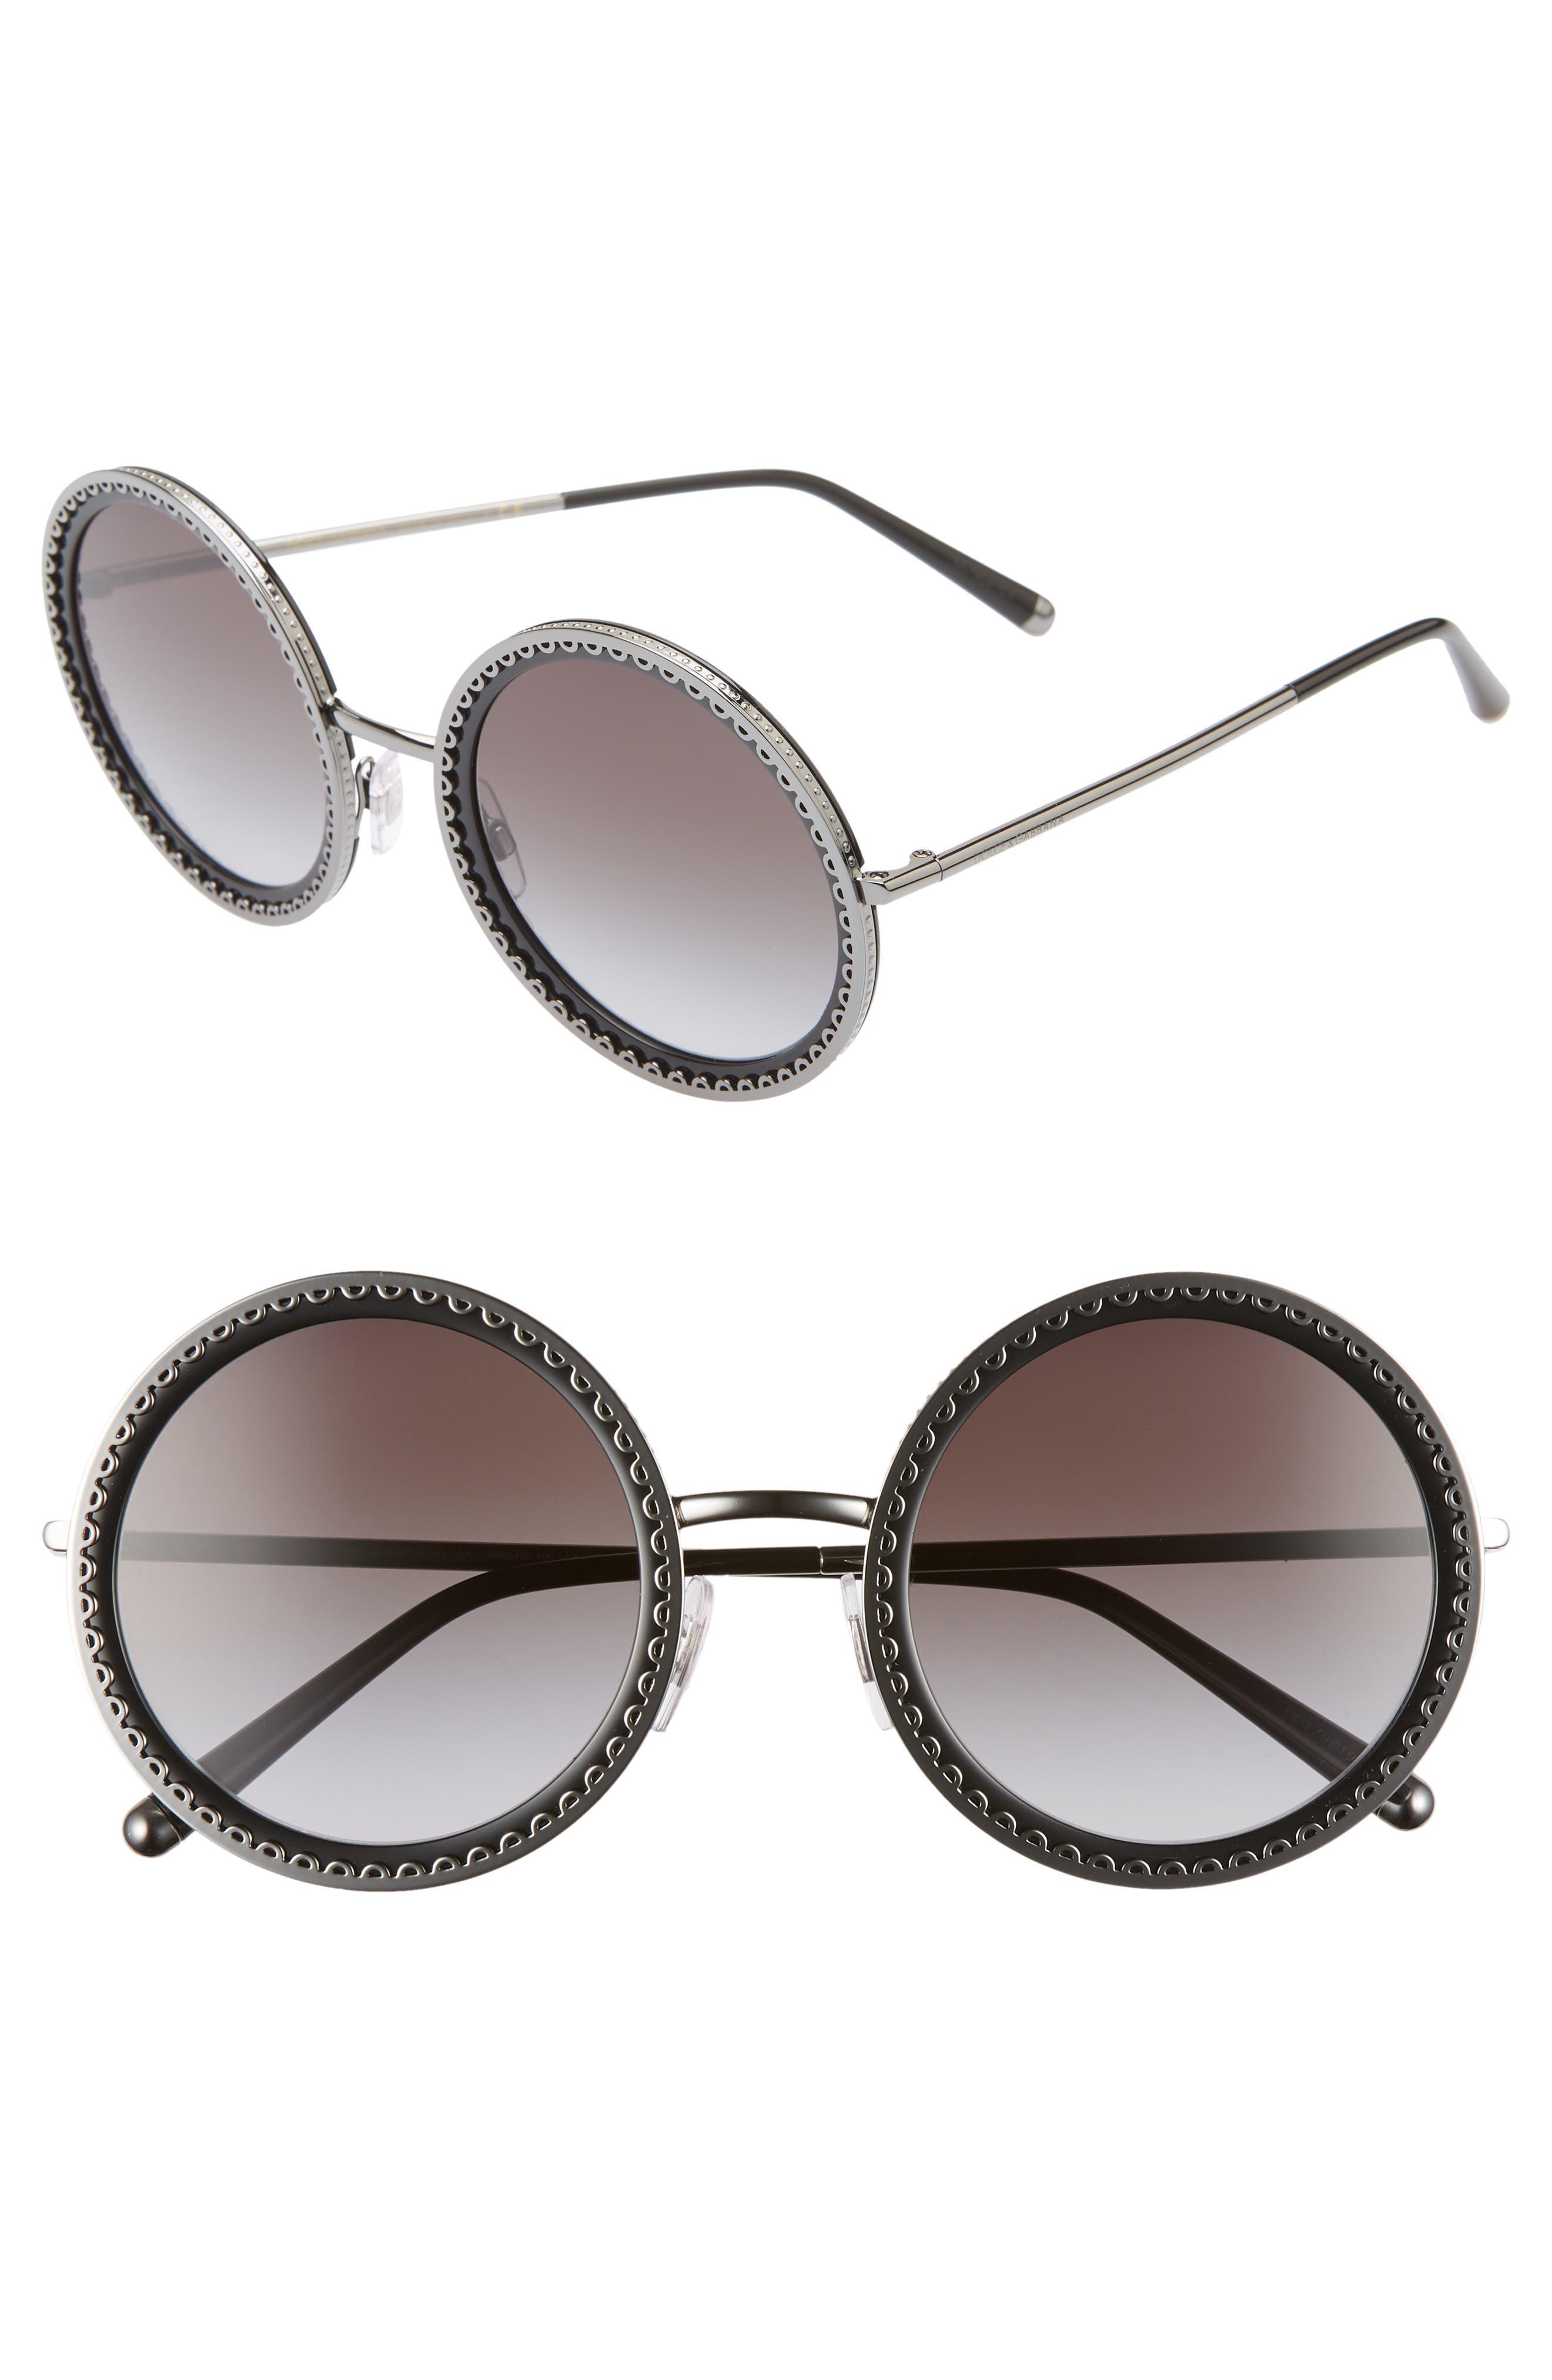 Sacred Heart 53mm Gradient Round Sunglasses,                         Main,                         color, DARK GUNMETAL GRADIENT